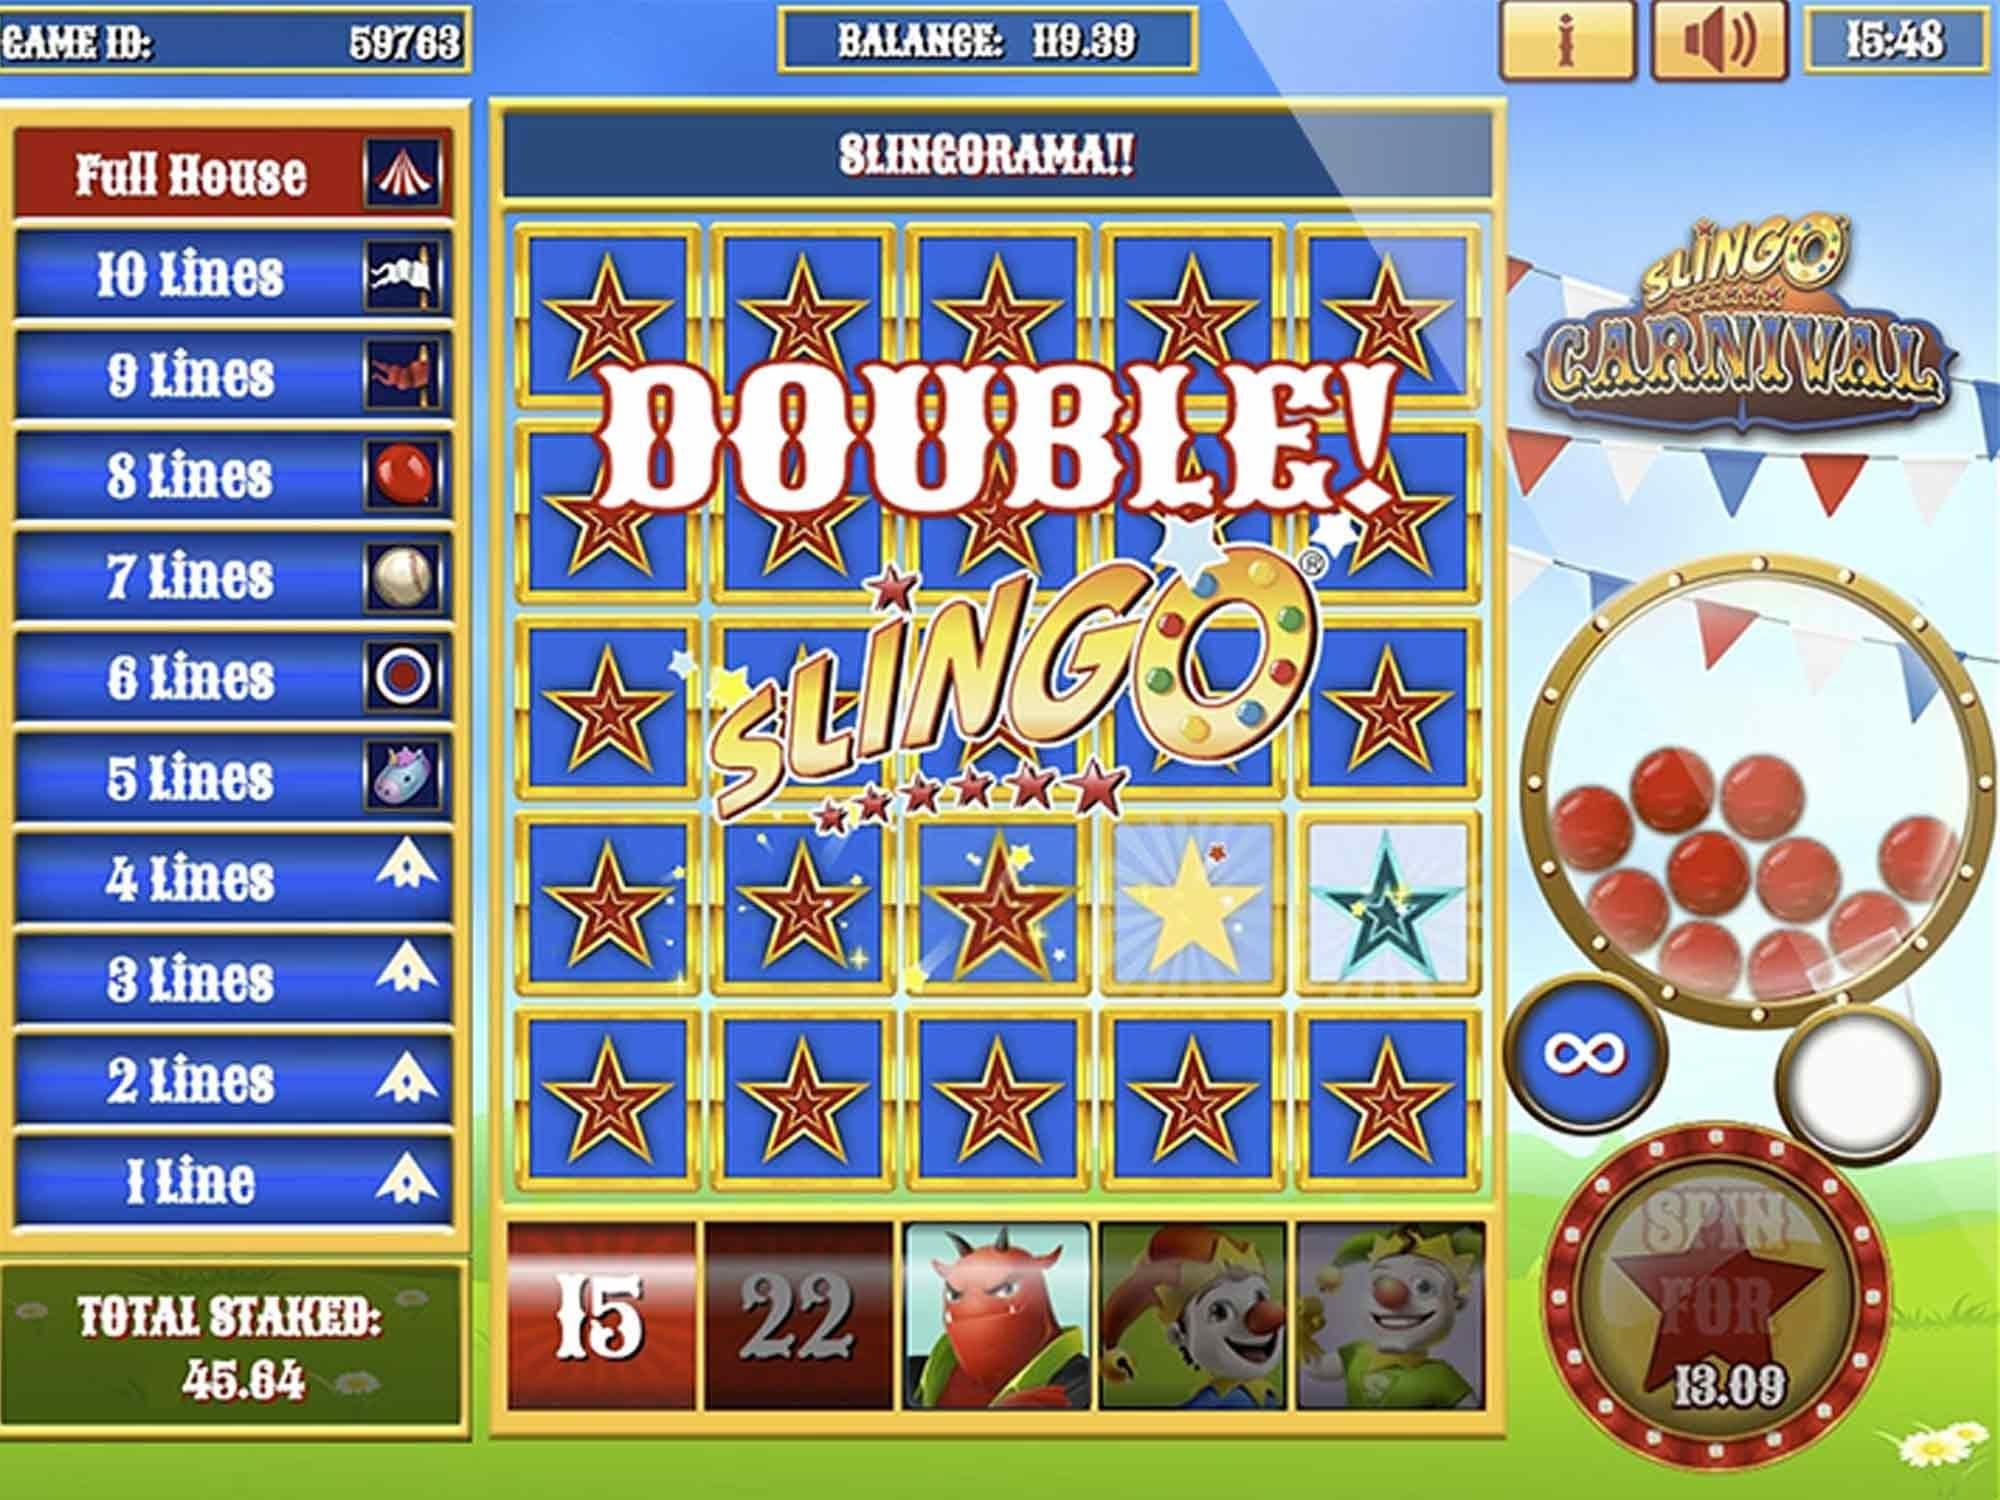 Slingo Carnival Slots Win